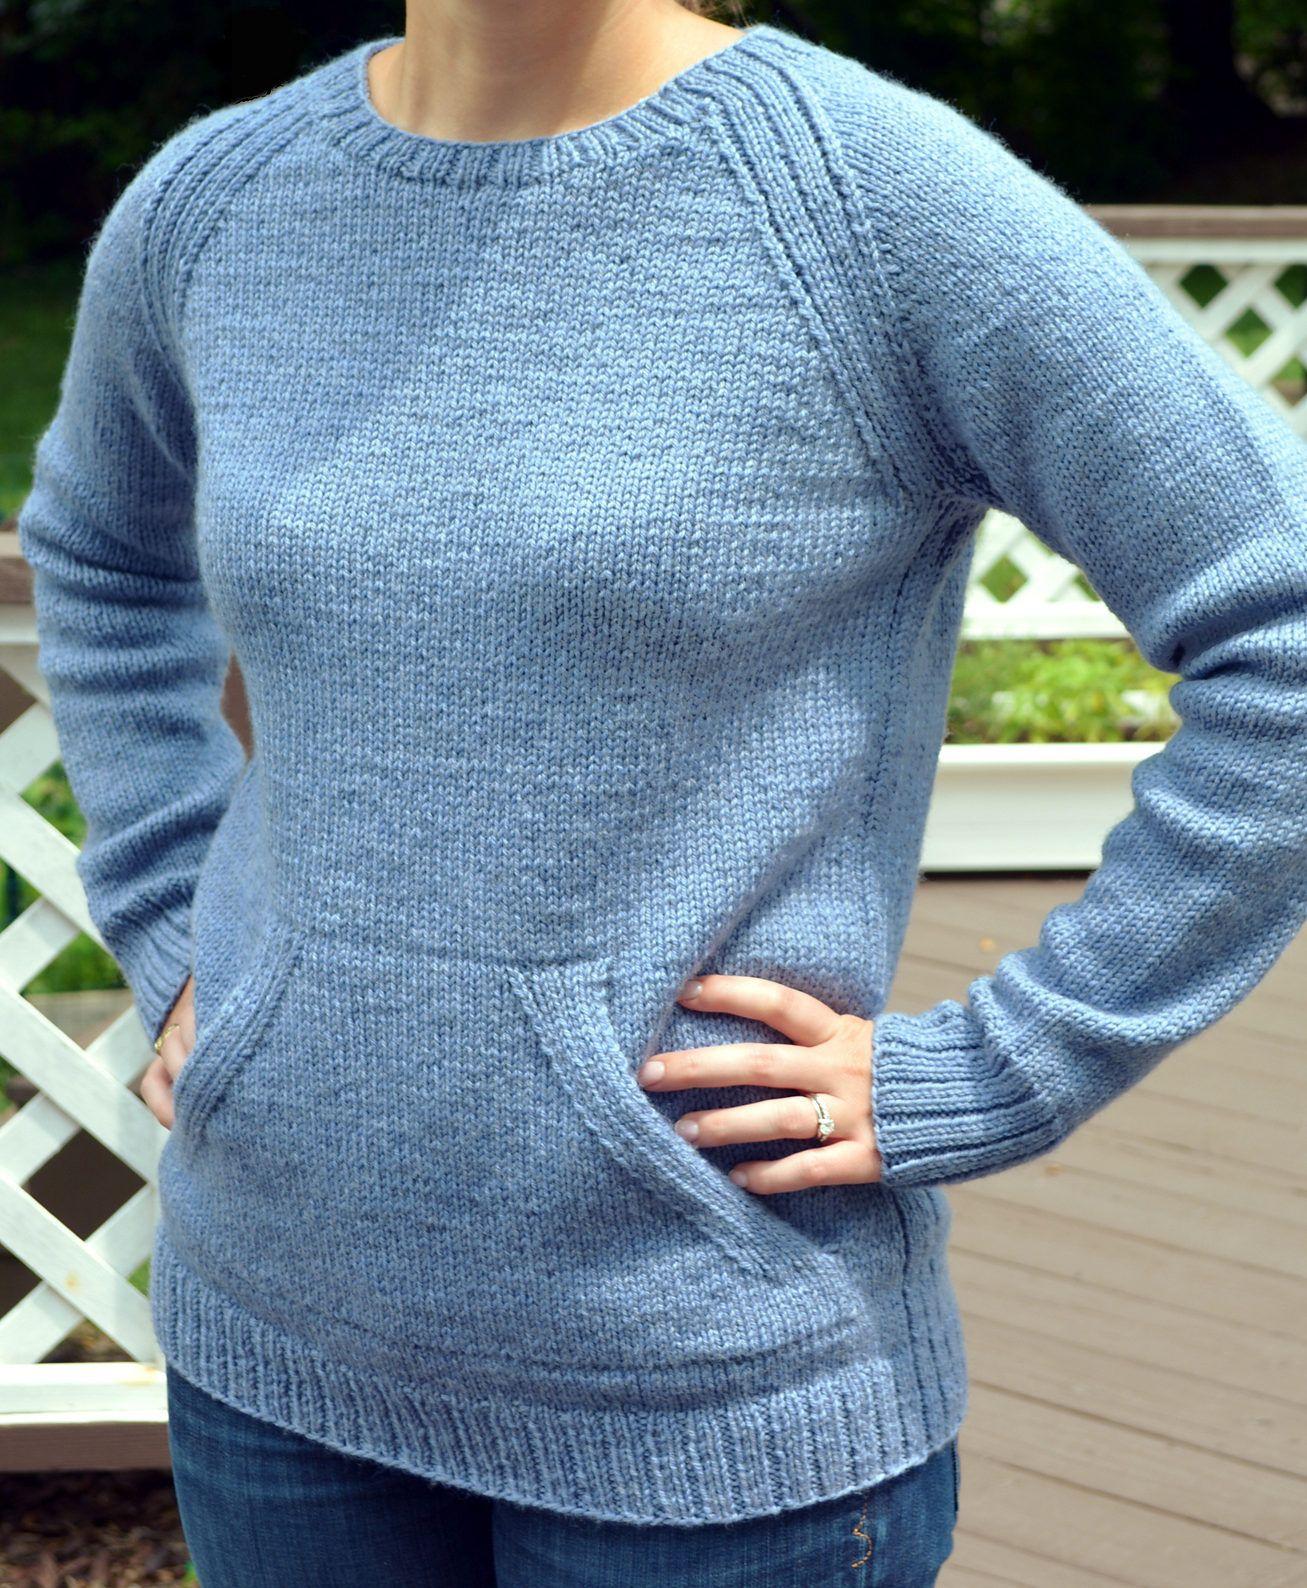 Free Knitting Pattern for Sweatshirt Sweater - Purl Soho ...